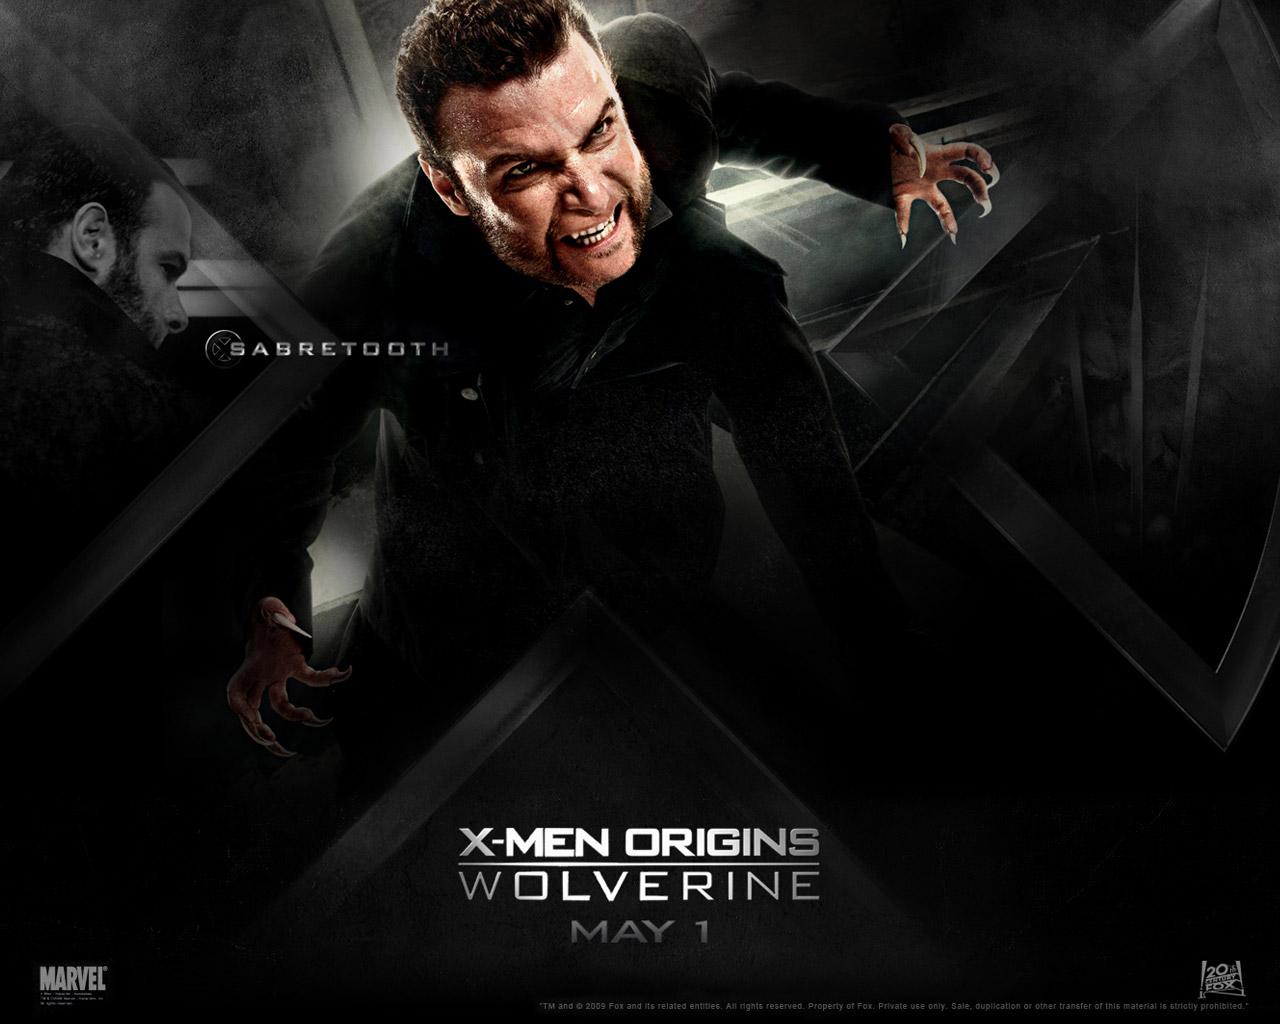 Wallpapers X Men X Men Origins Wolverine Movies